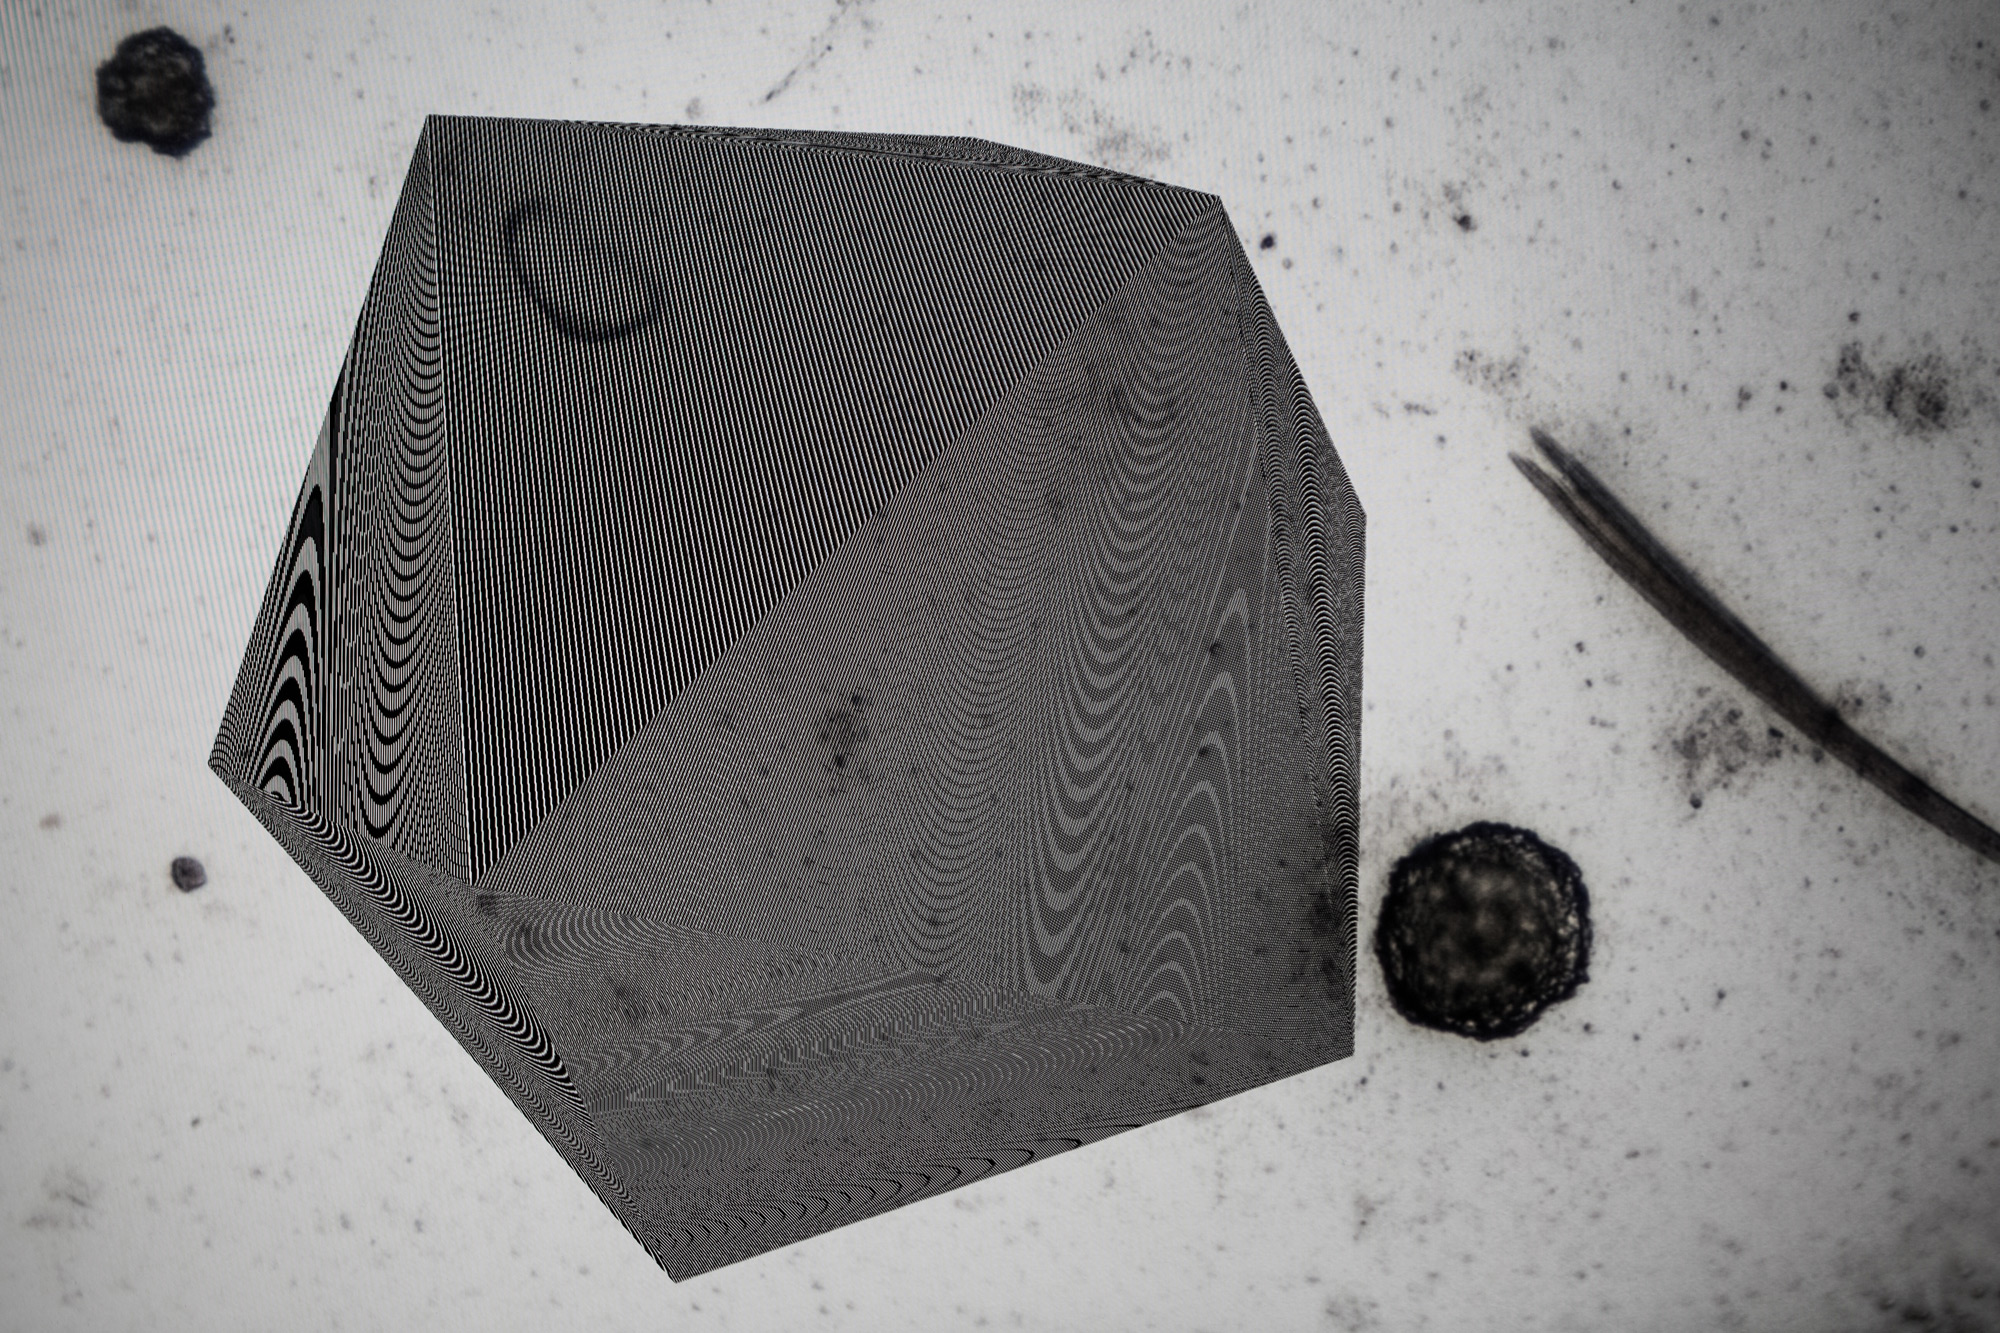 RRodner-Icosahedron-microscopic-2.jpg